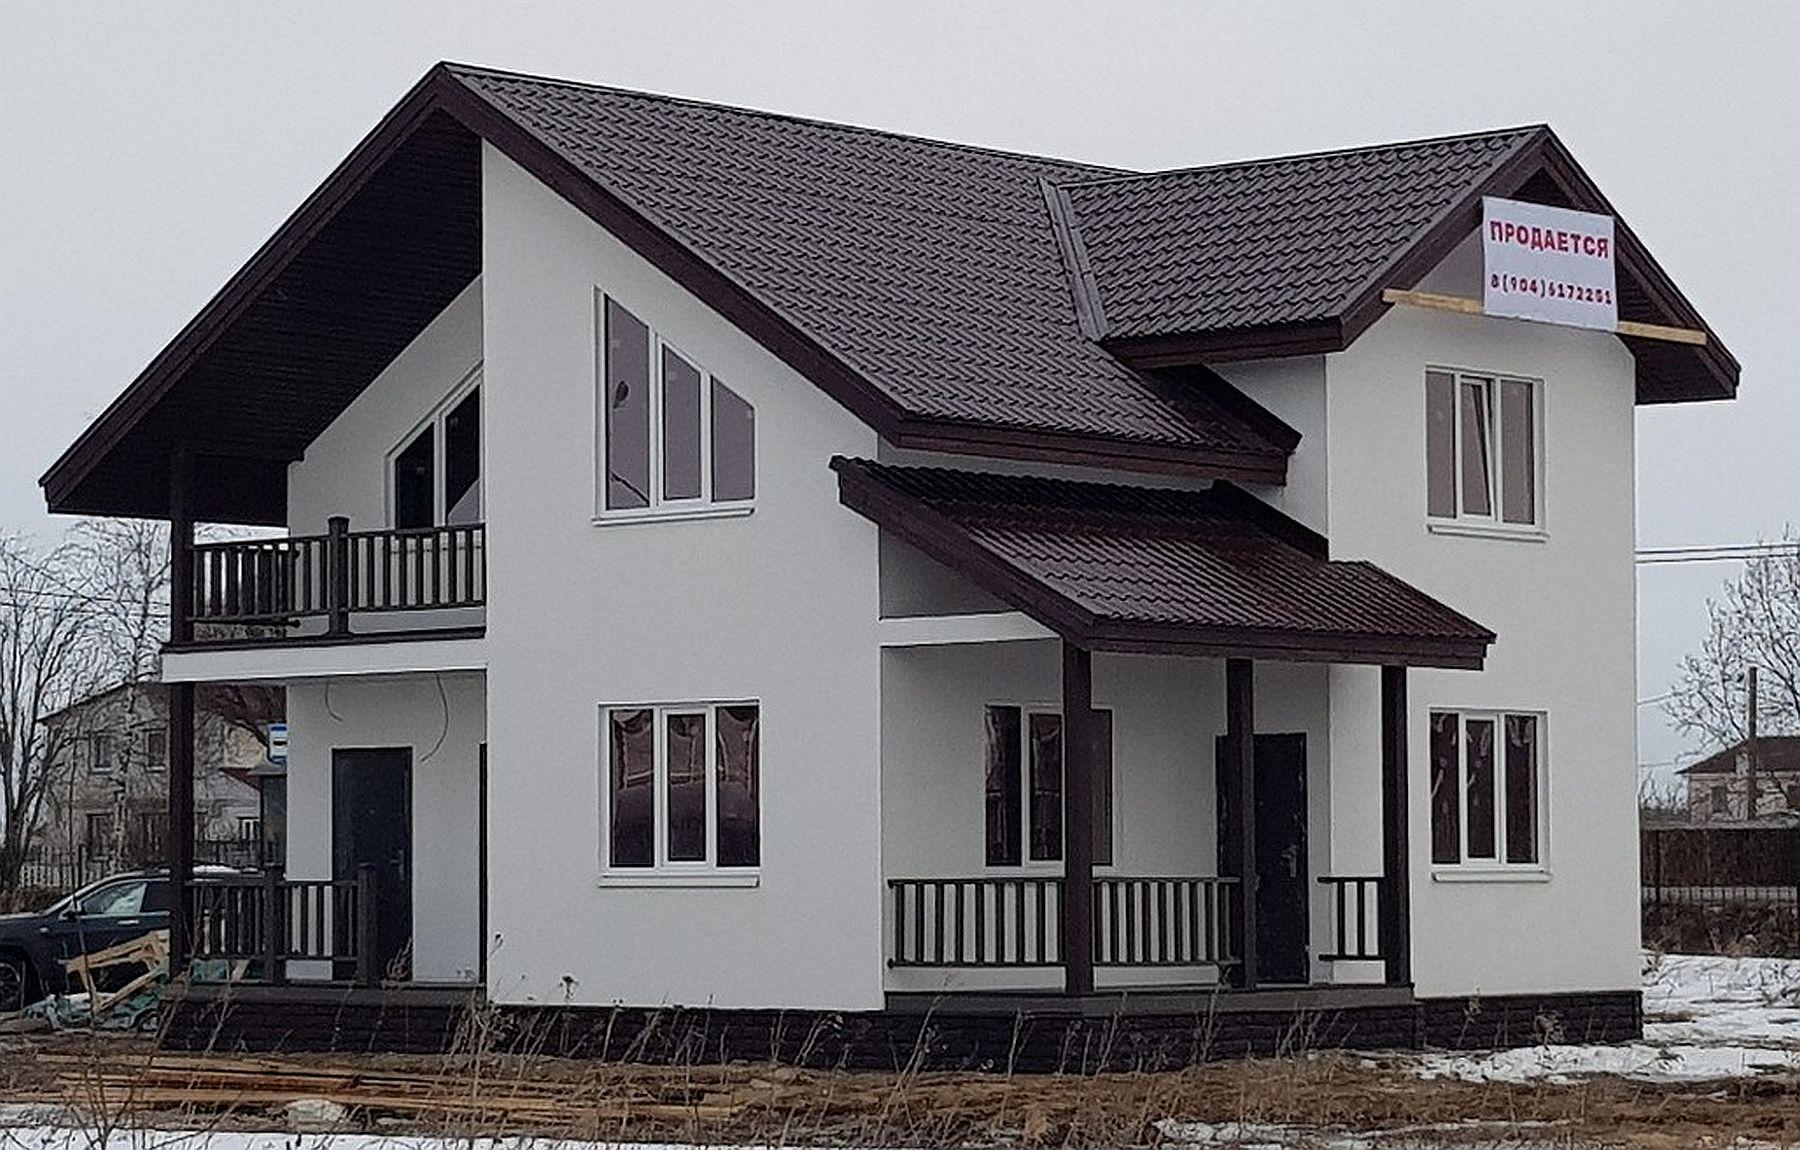 Готовый проект коттеджа 126 кв. м / Артикул СМ-115 фасад